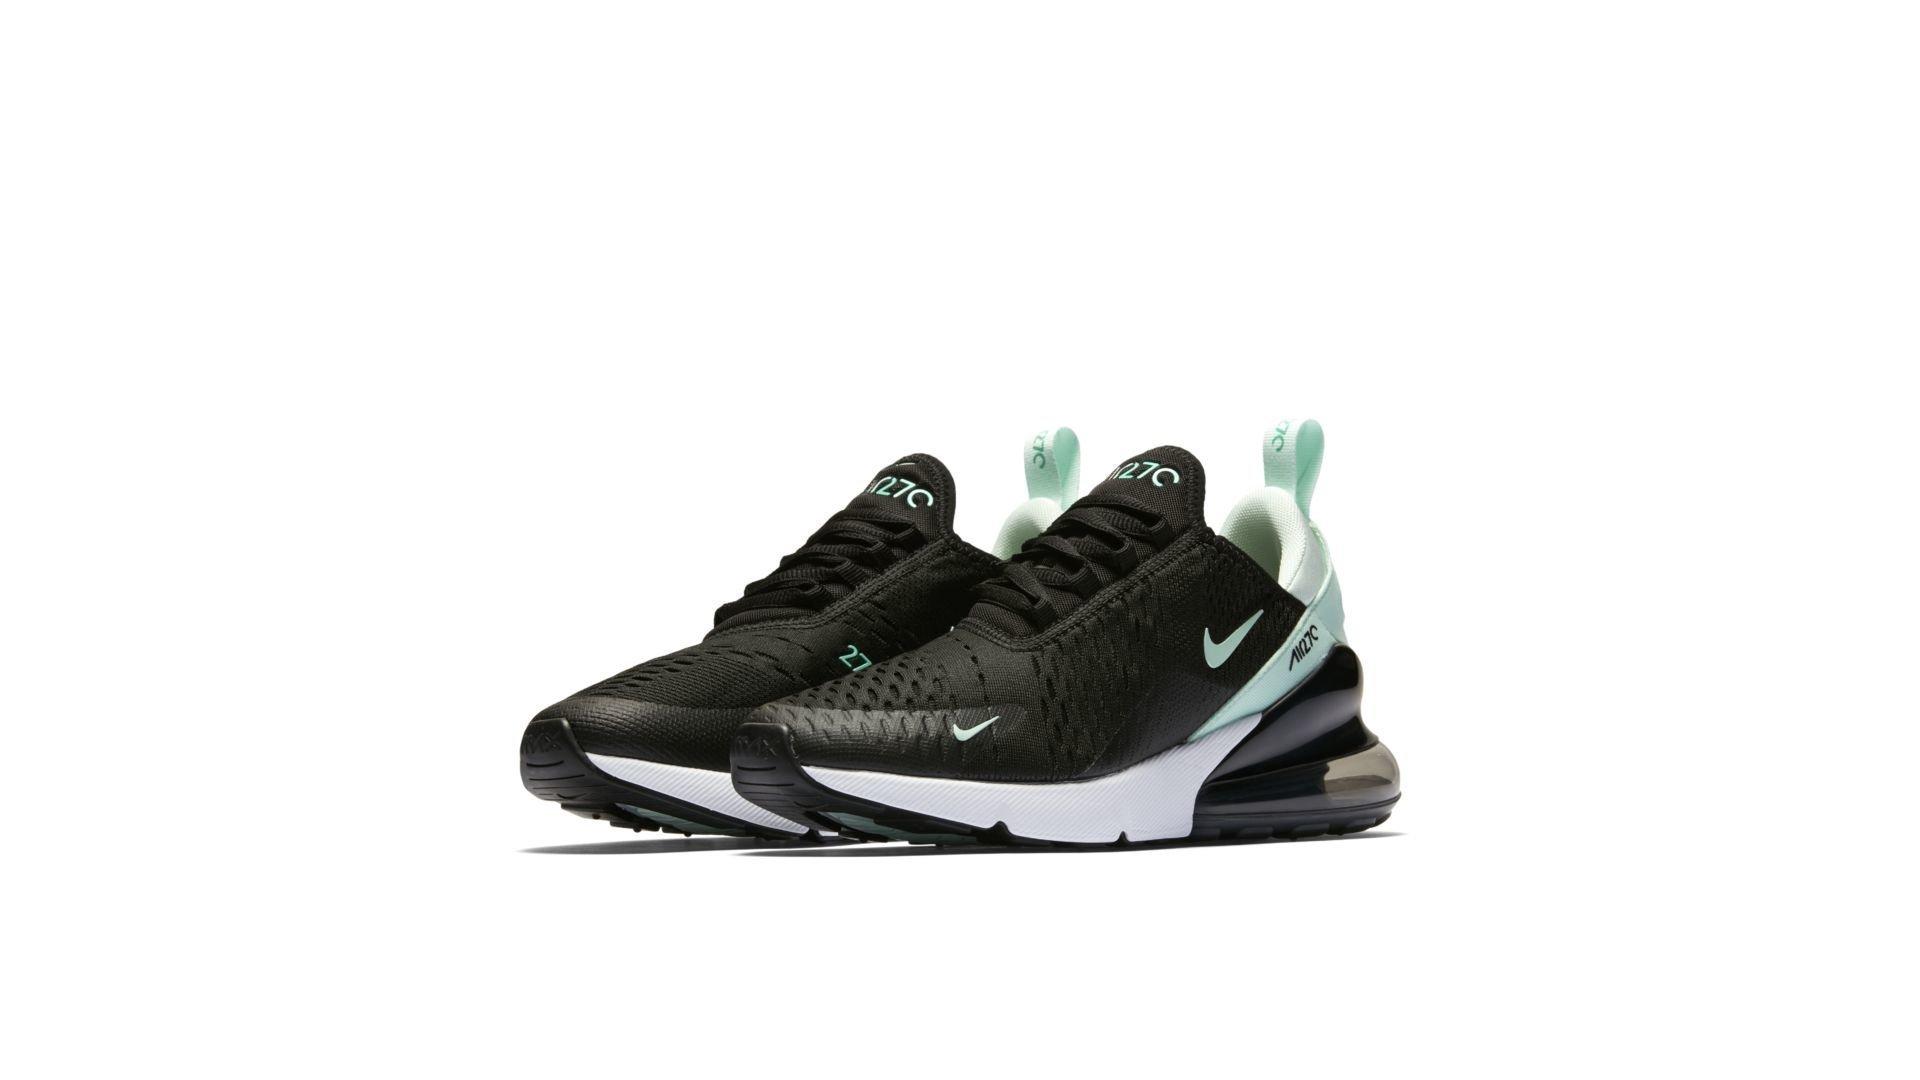 Nike WMNS Air Max 270 'Igloo' (AH6789 008)